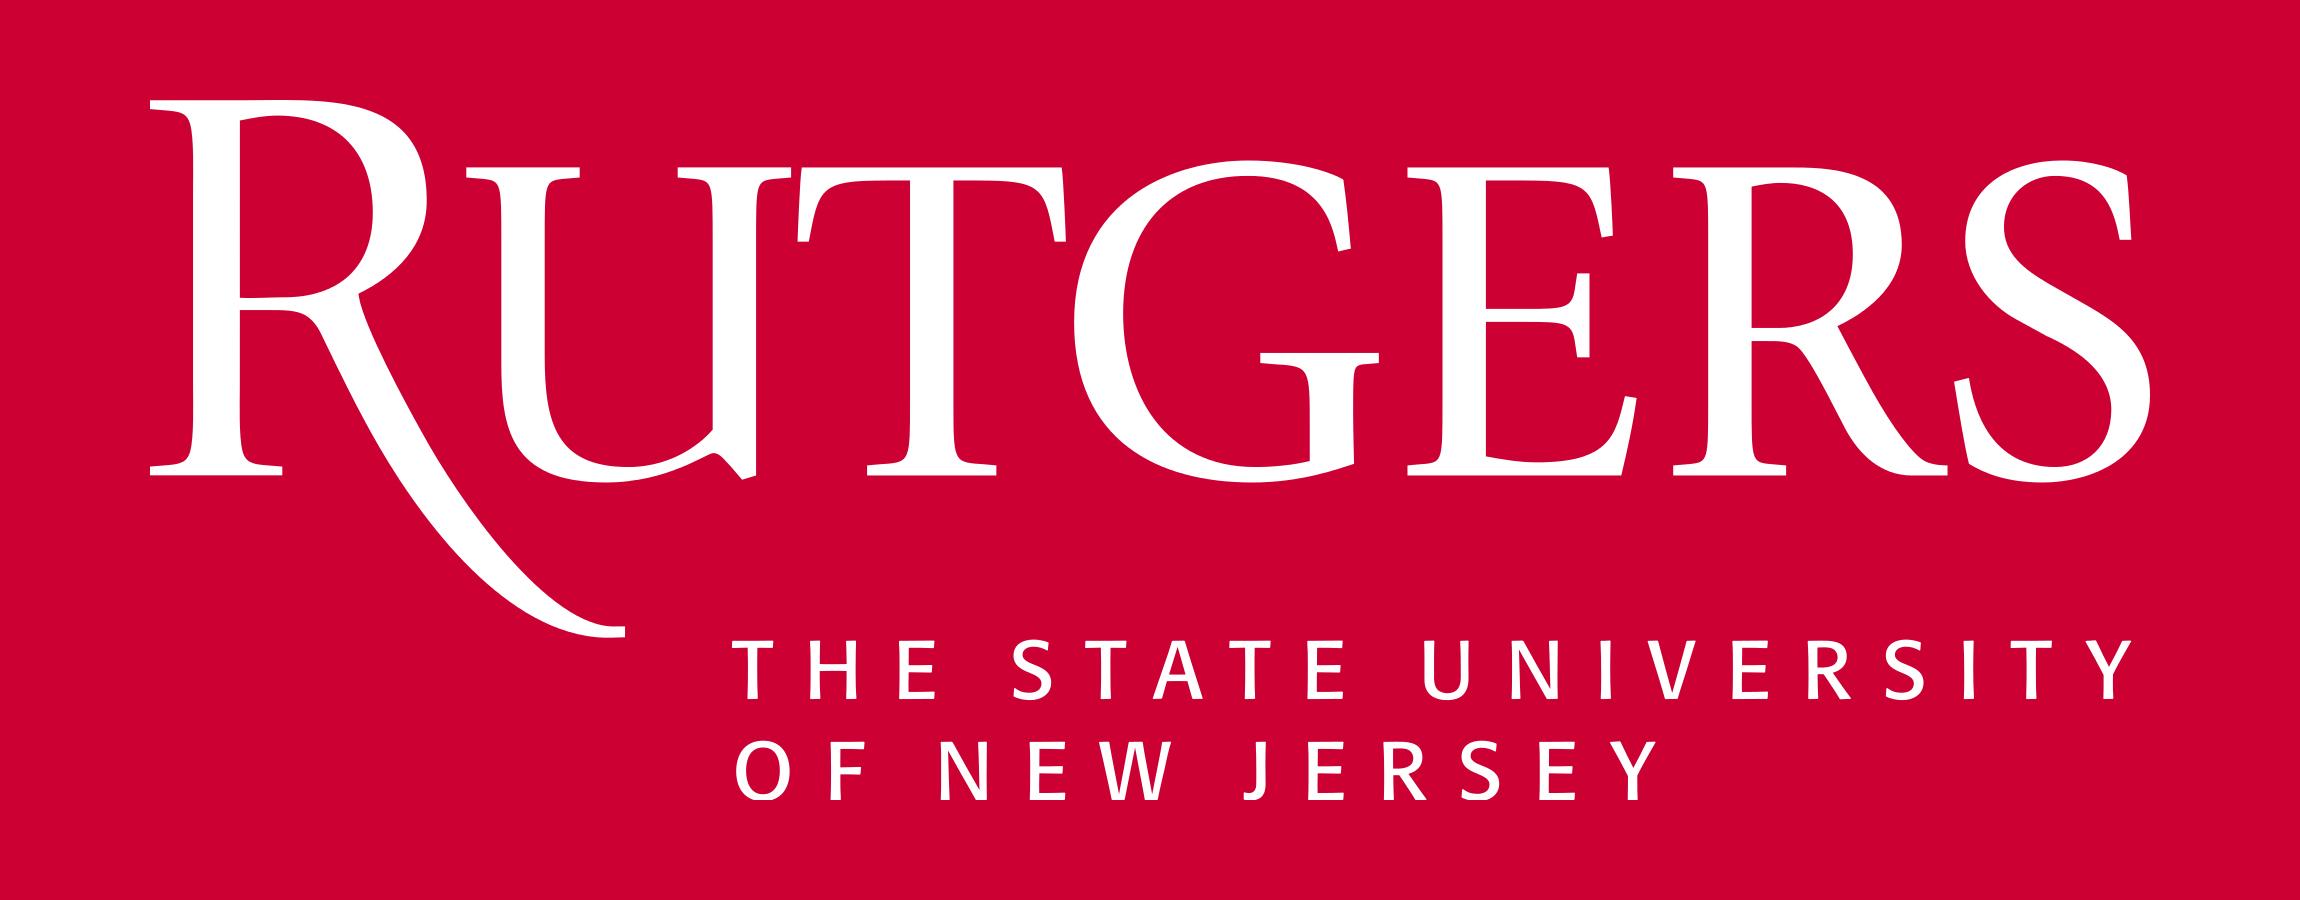 Rutgers university logo rutgers university symbol meaning rutgers shield emblem buycottarizona Image collections